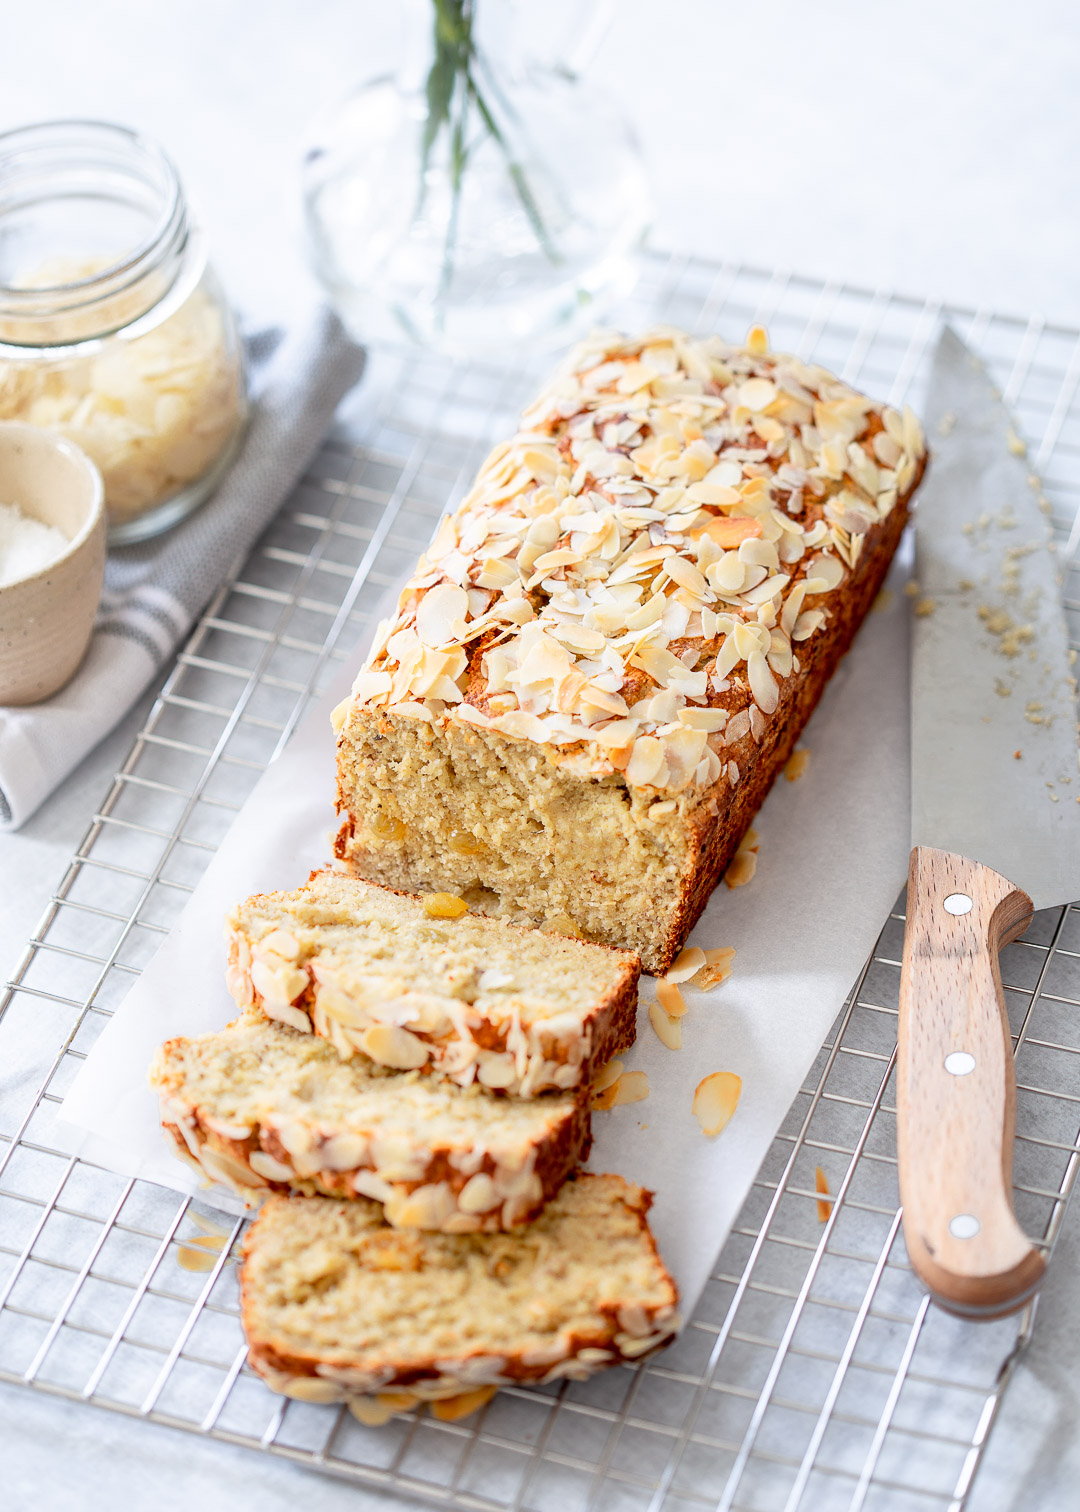 Zo maak je bananenbrood (bananabread/bananacake)